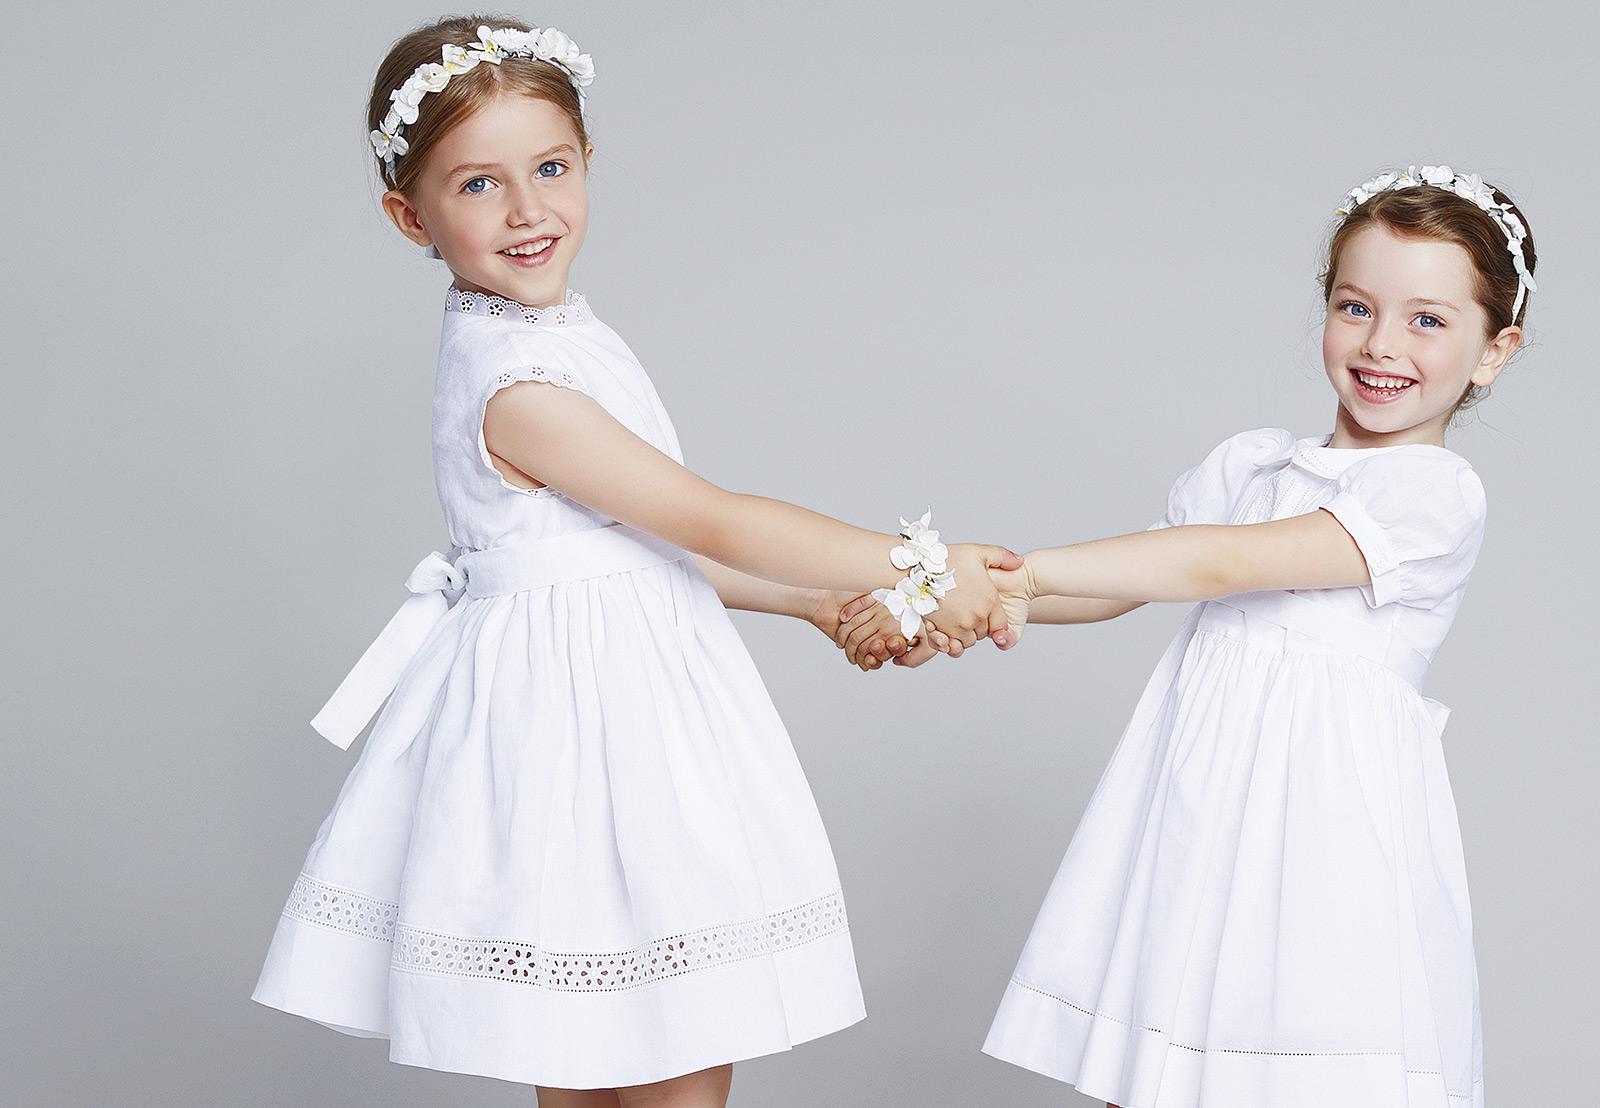 Dolce and Gabbana Spring Summer 2014 white dresses